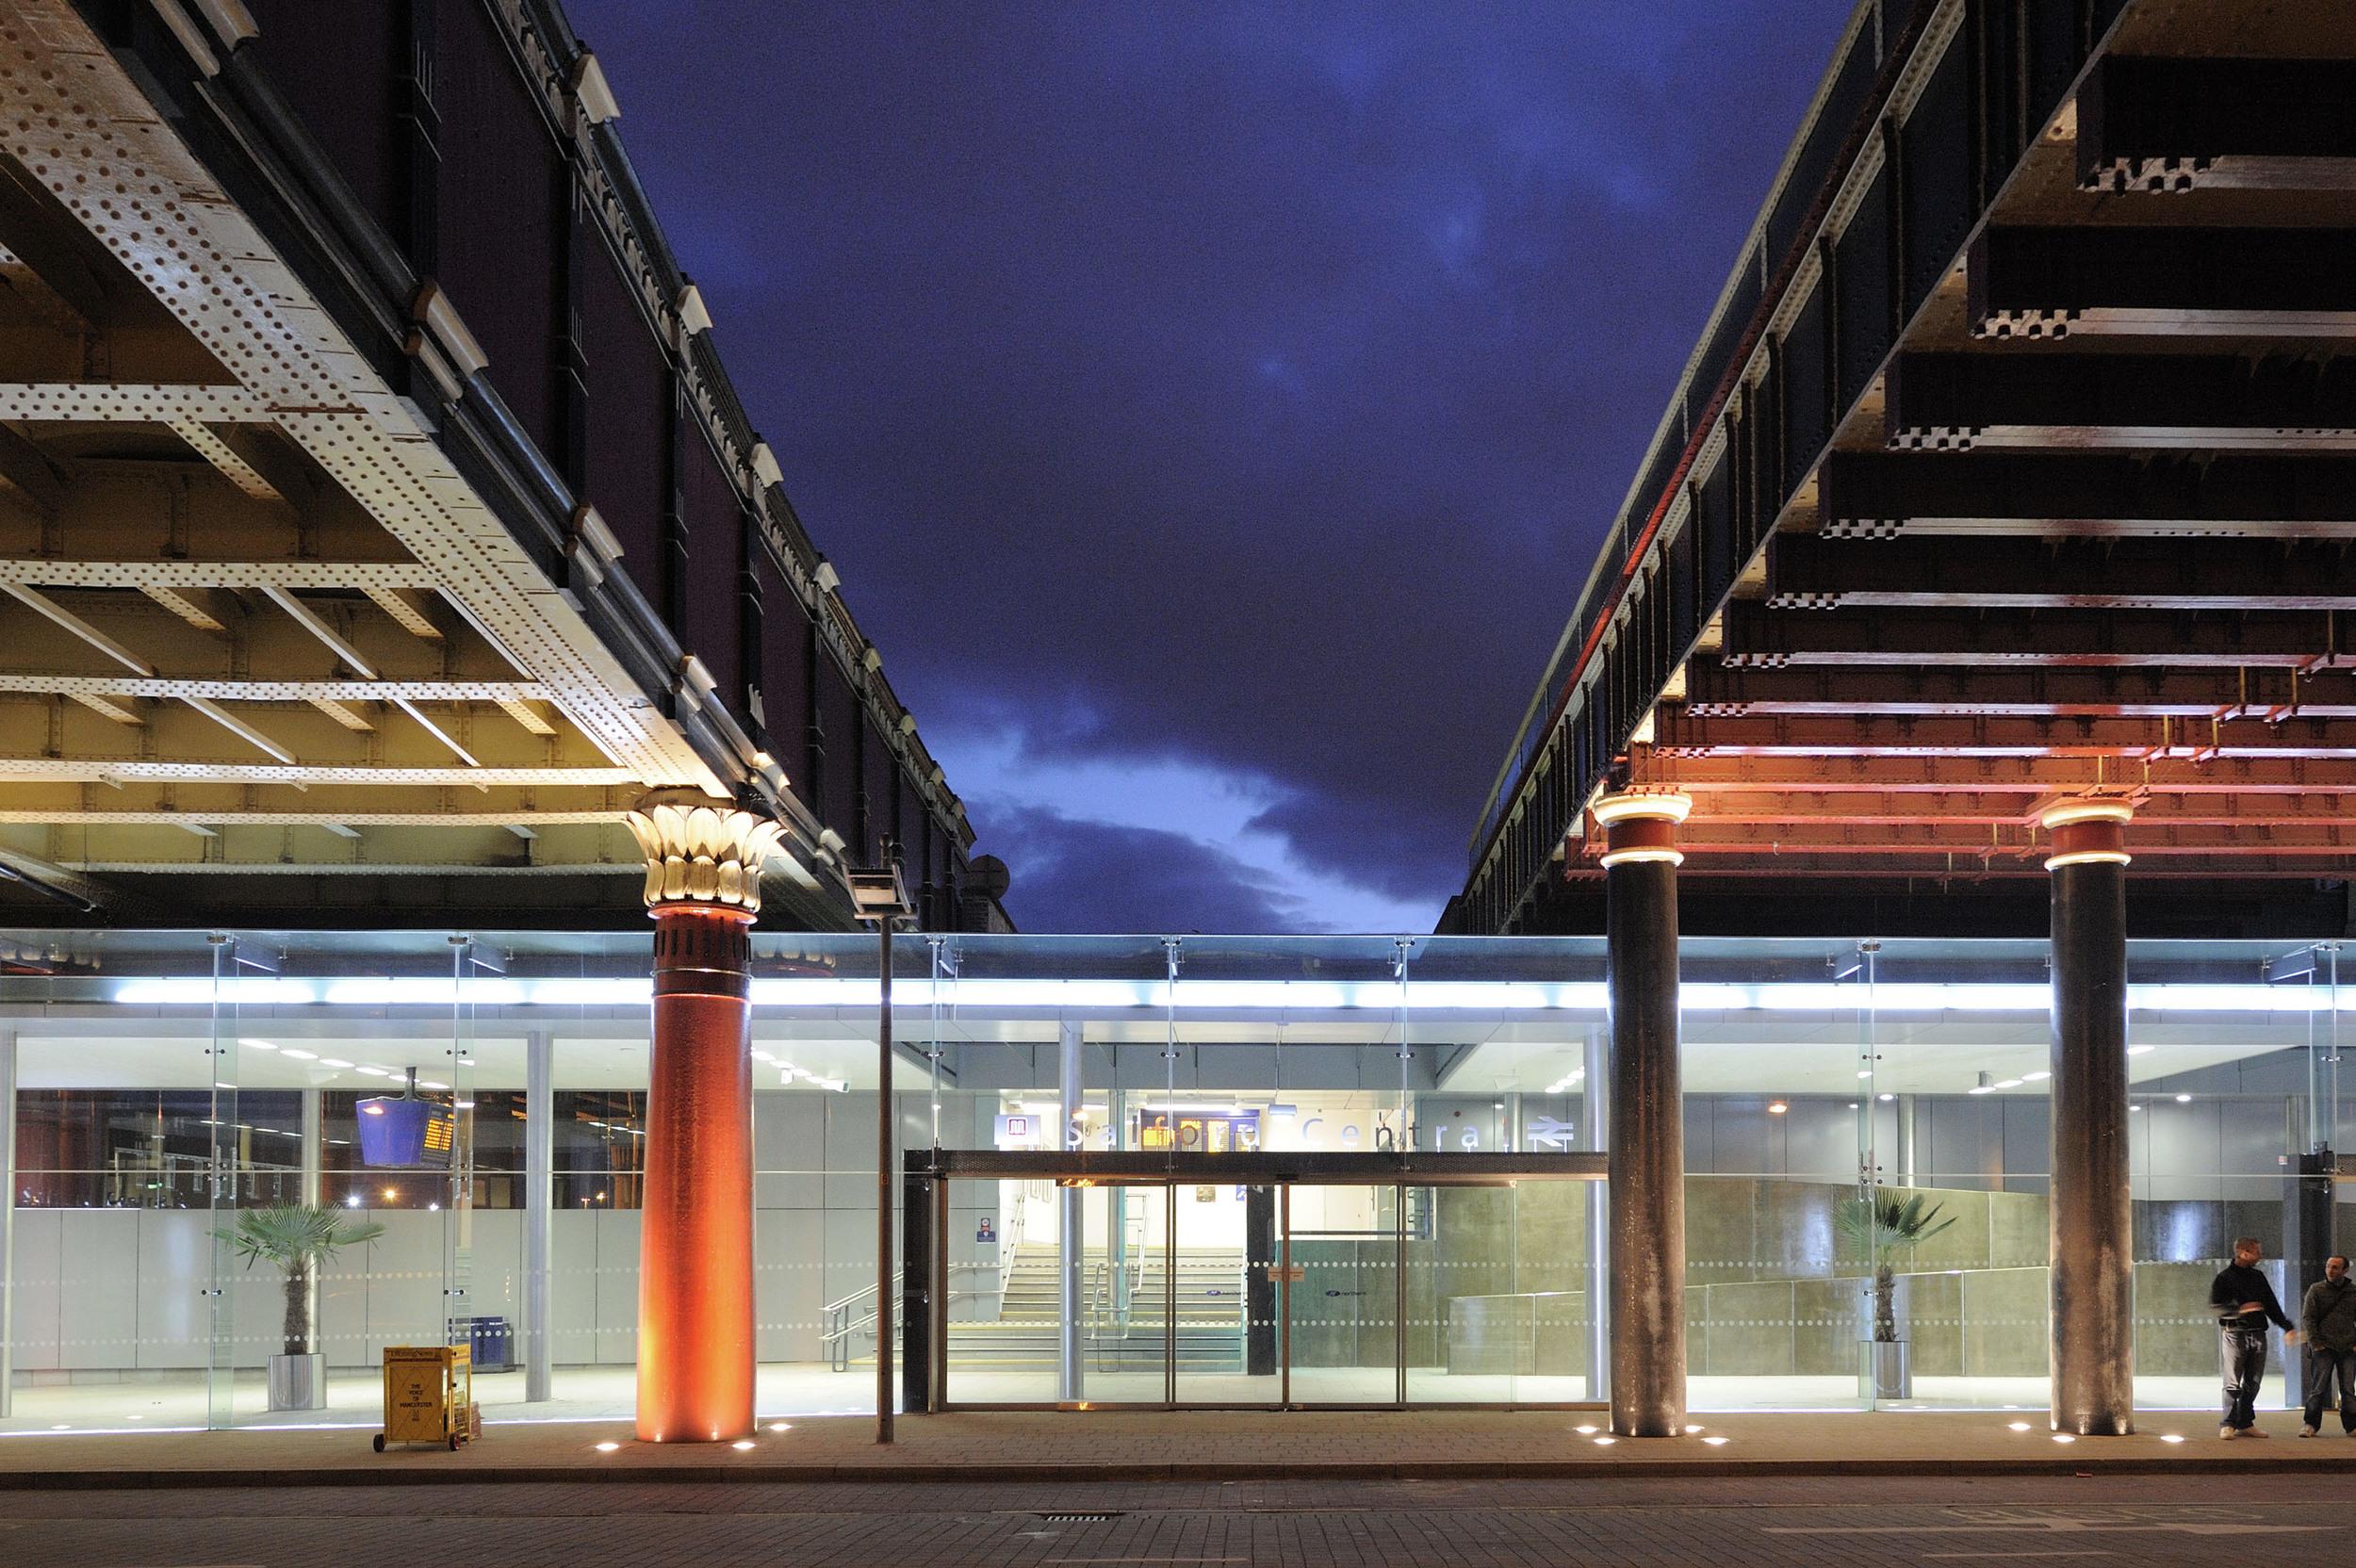 Salford Central Station at Night 2